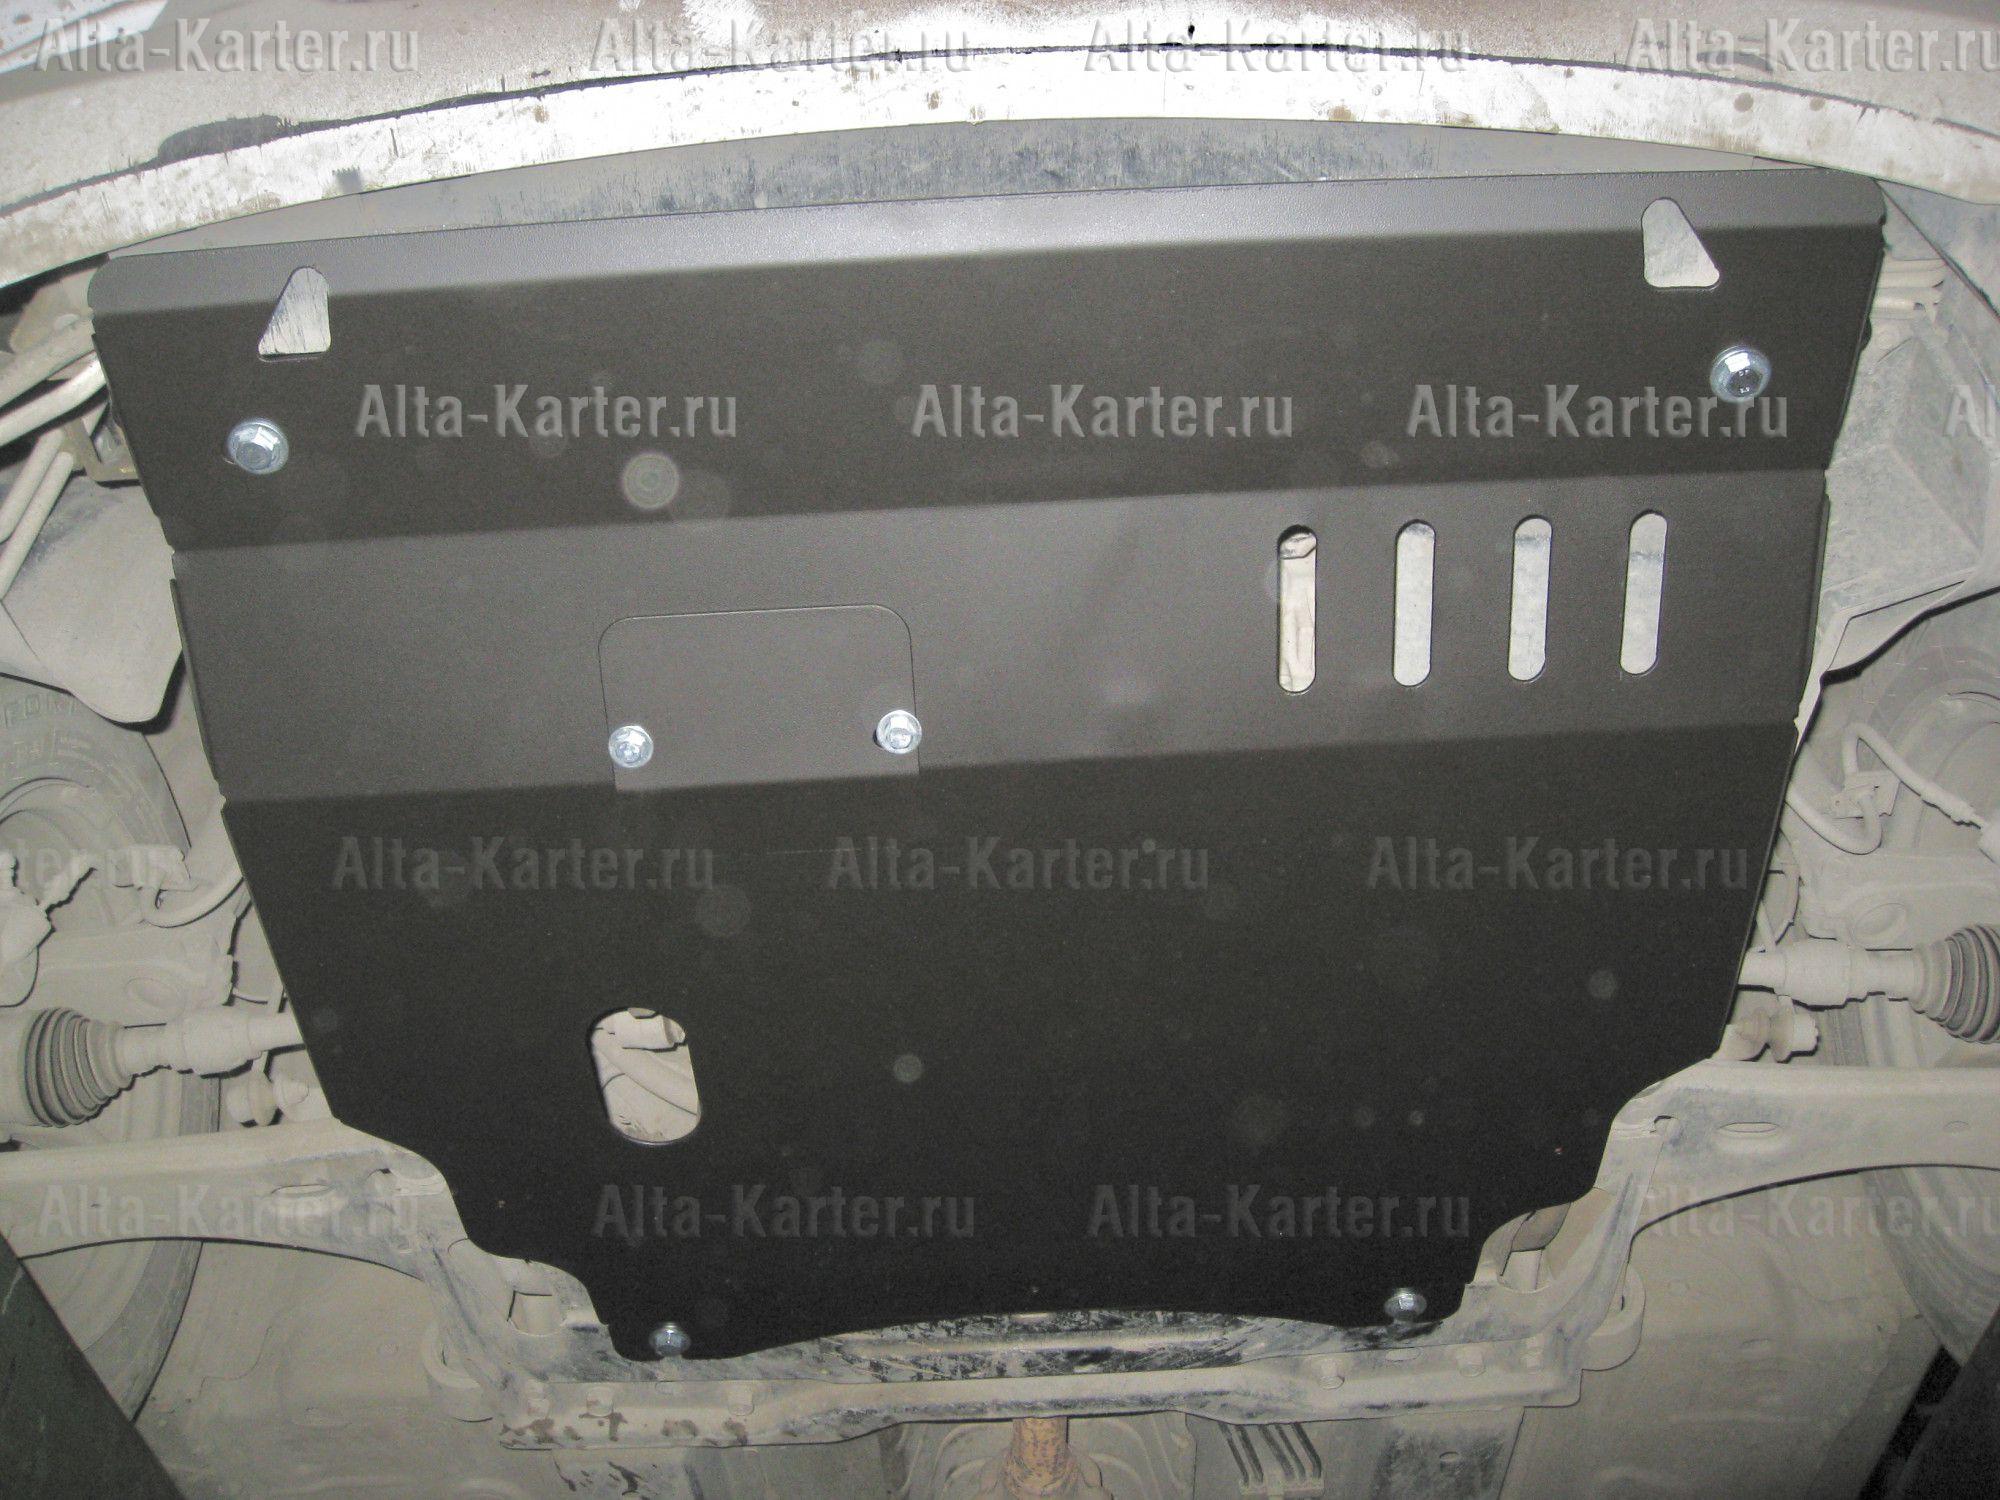 Защита Alfeco для картера и КПП Mazda Verisa 2WD 2004-2015. Артикул ALF.13.17